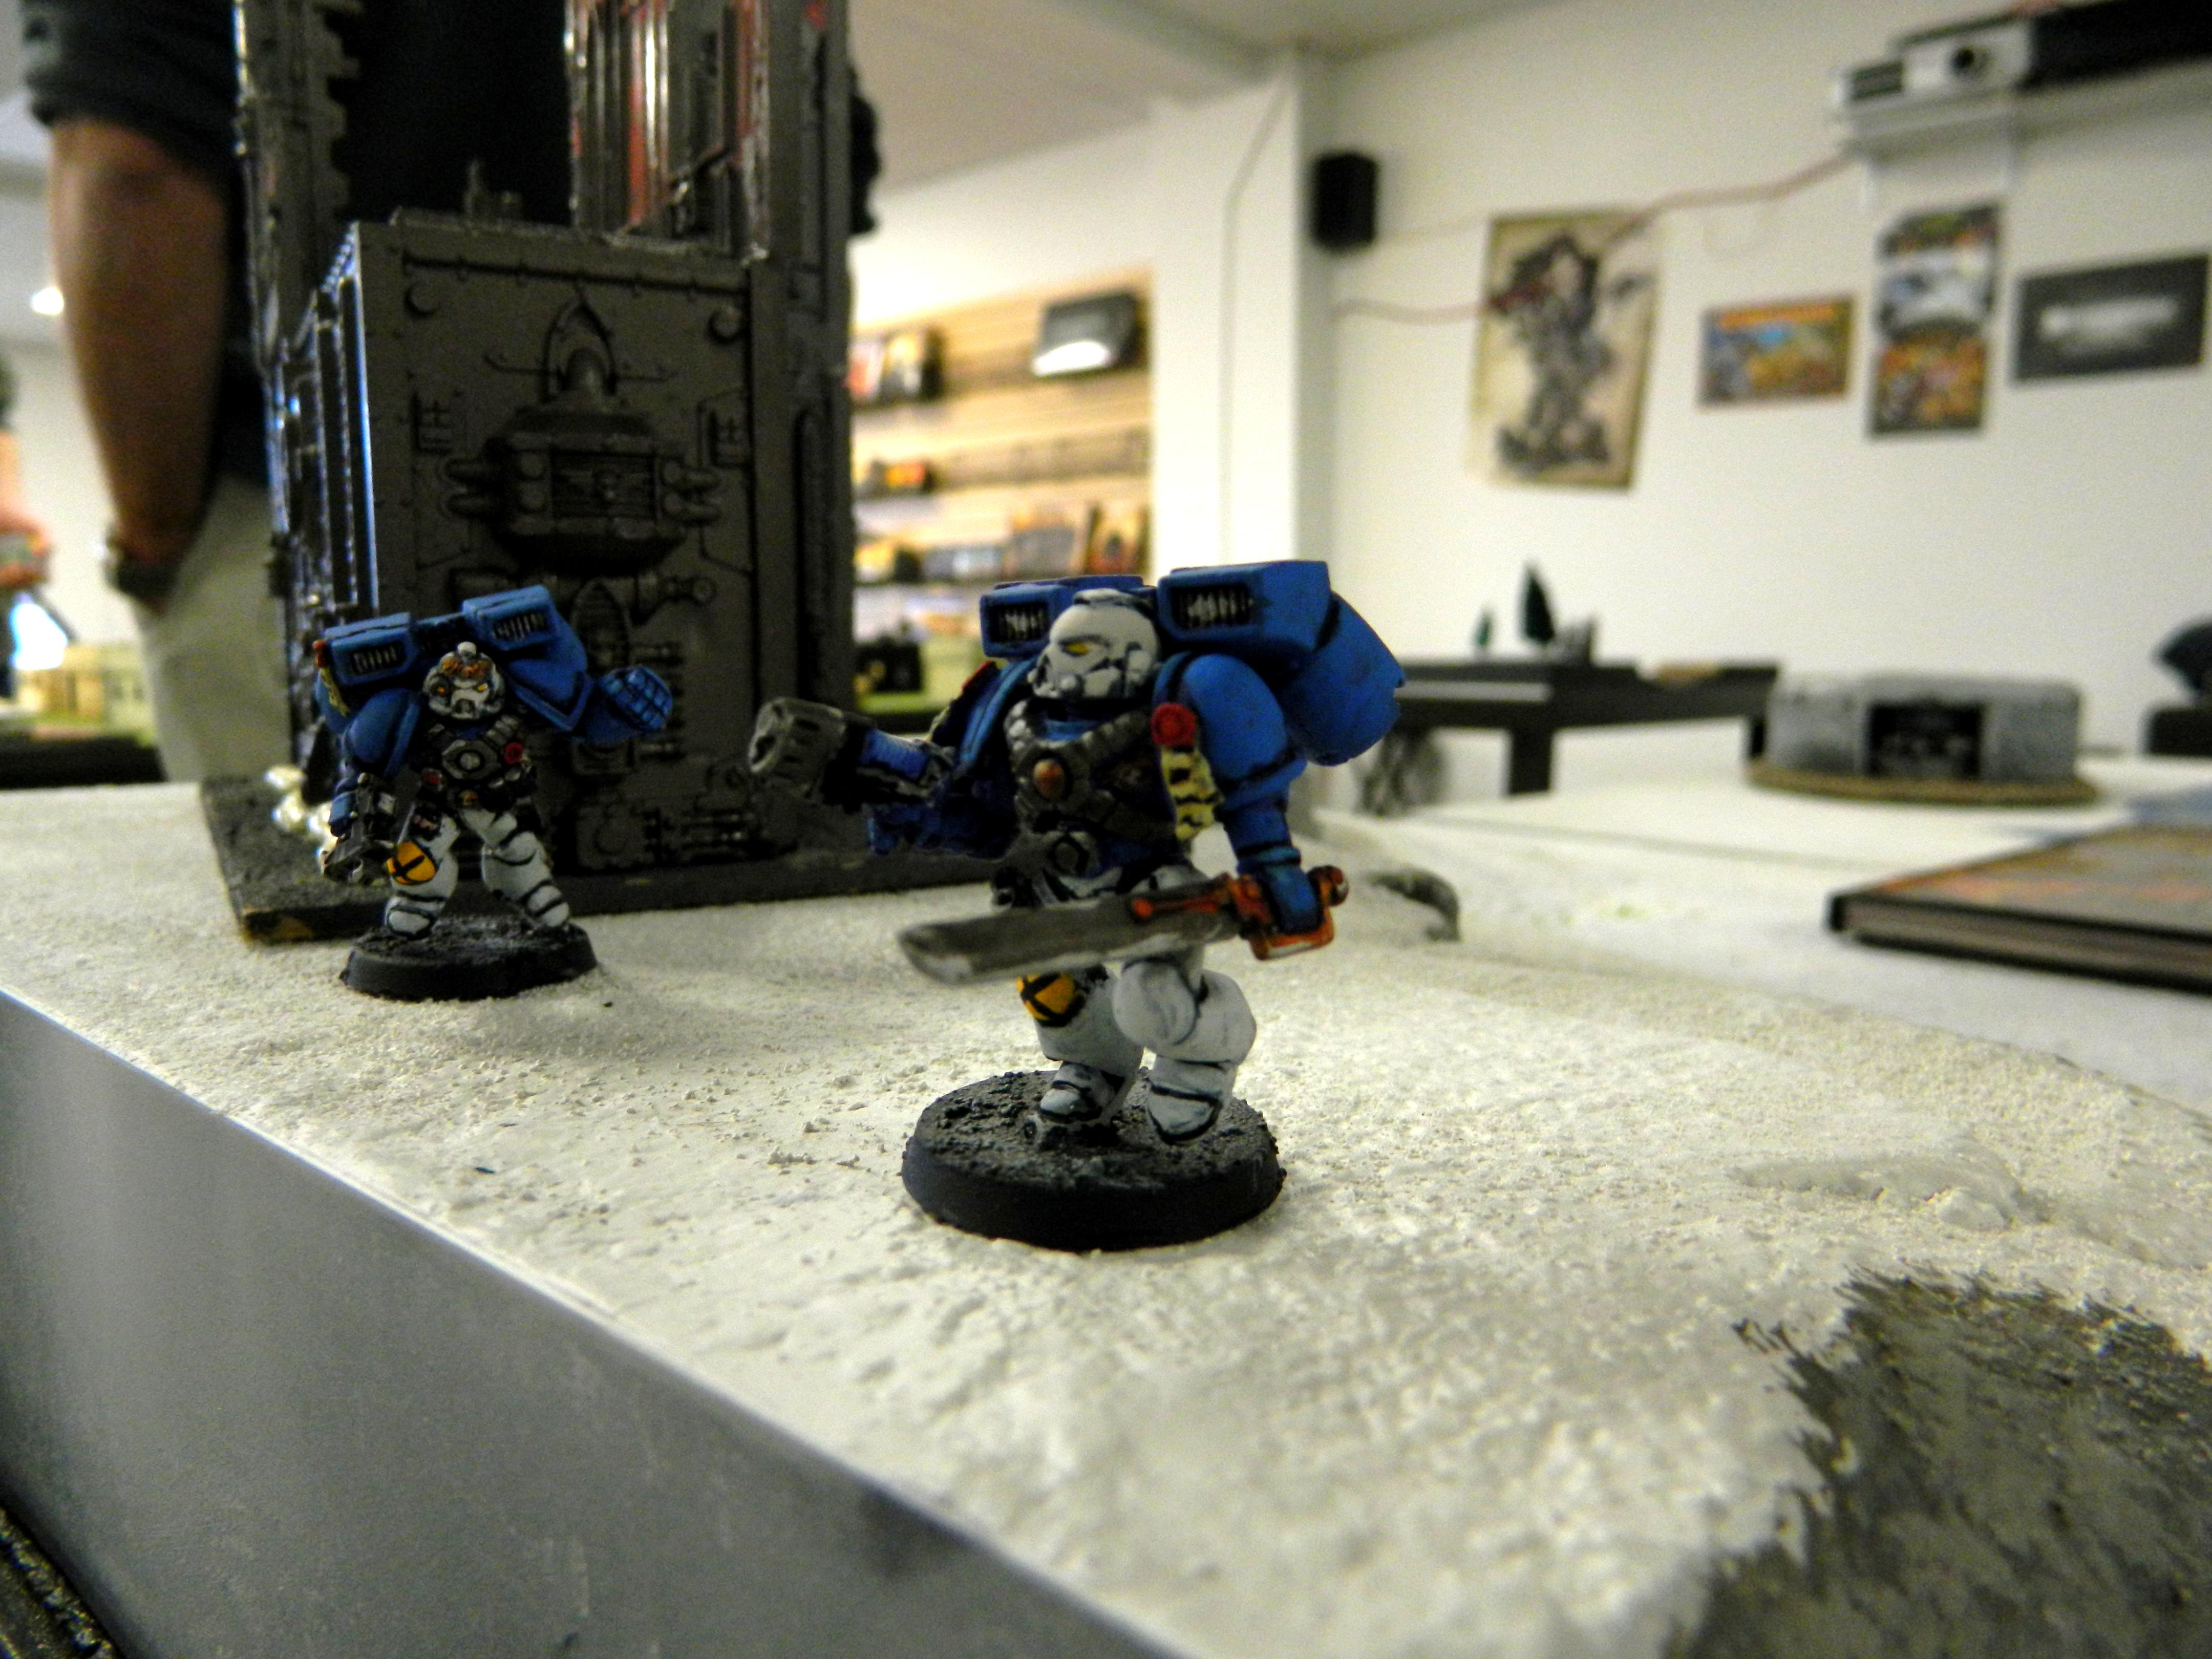 Emperor's Musketeers, Space Marines, Vanguard Veterans